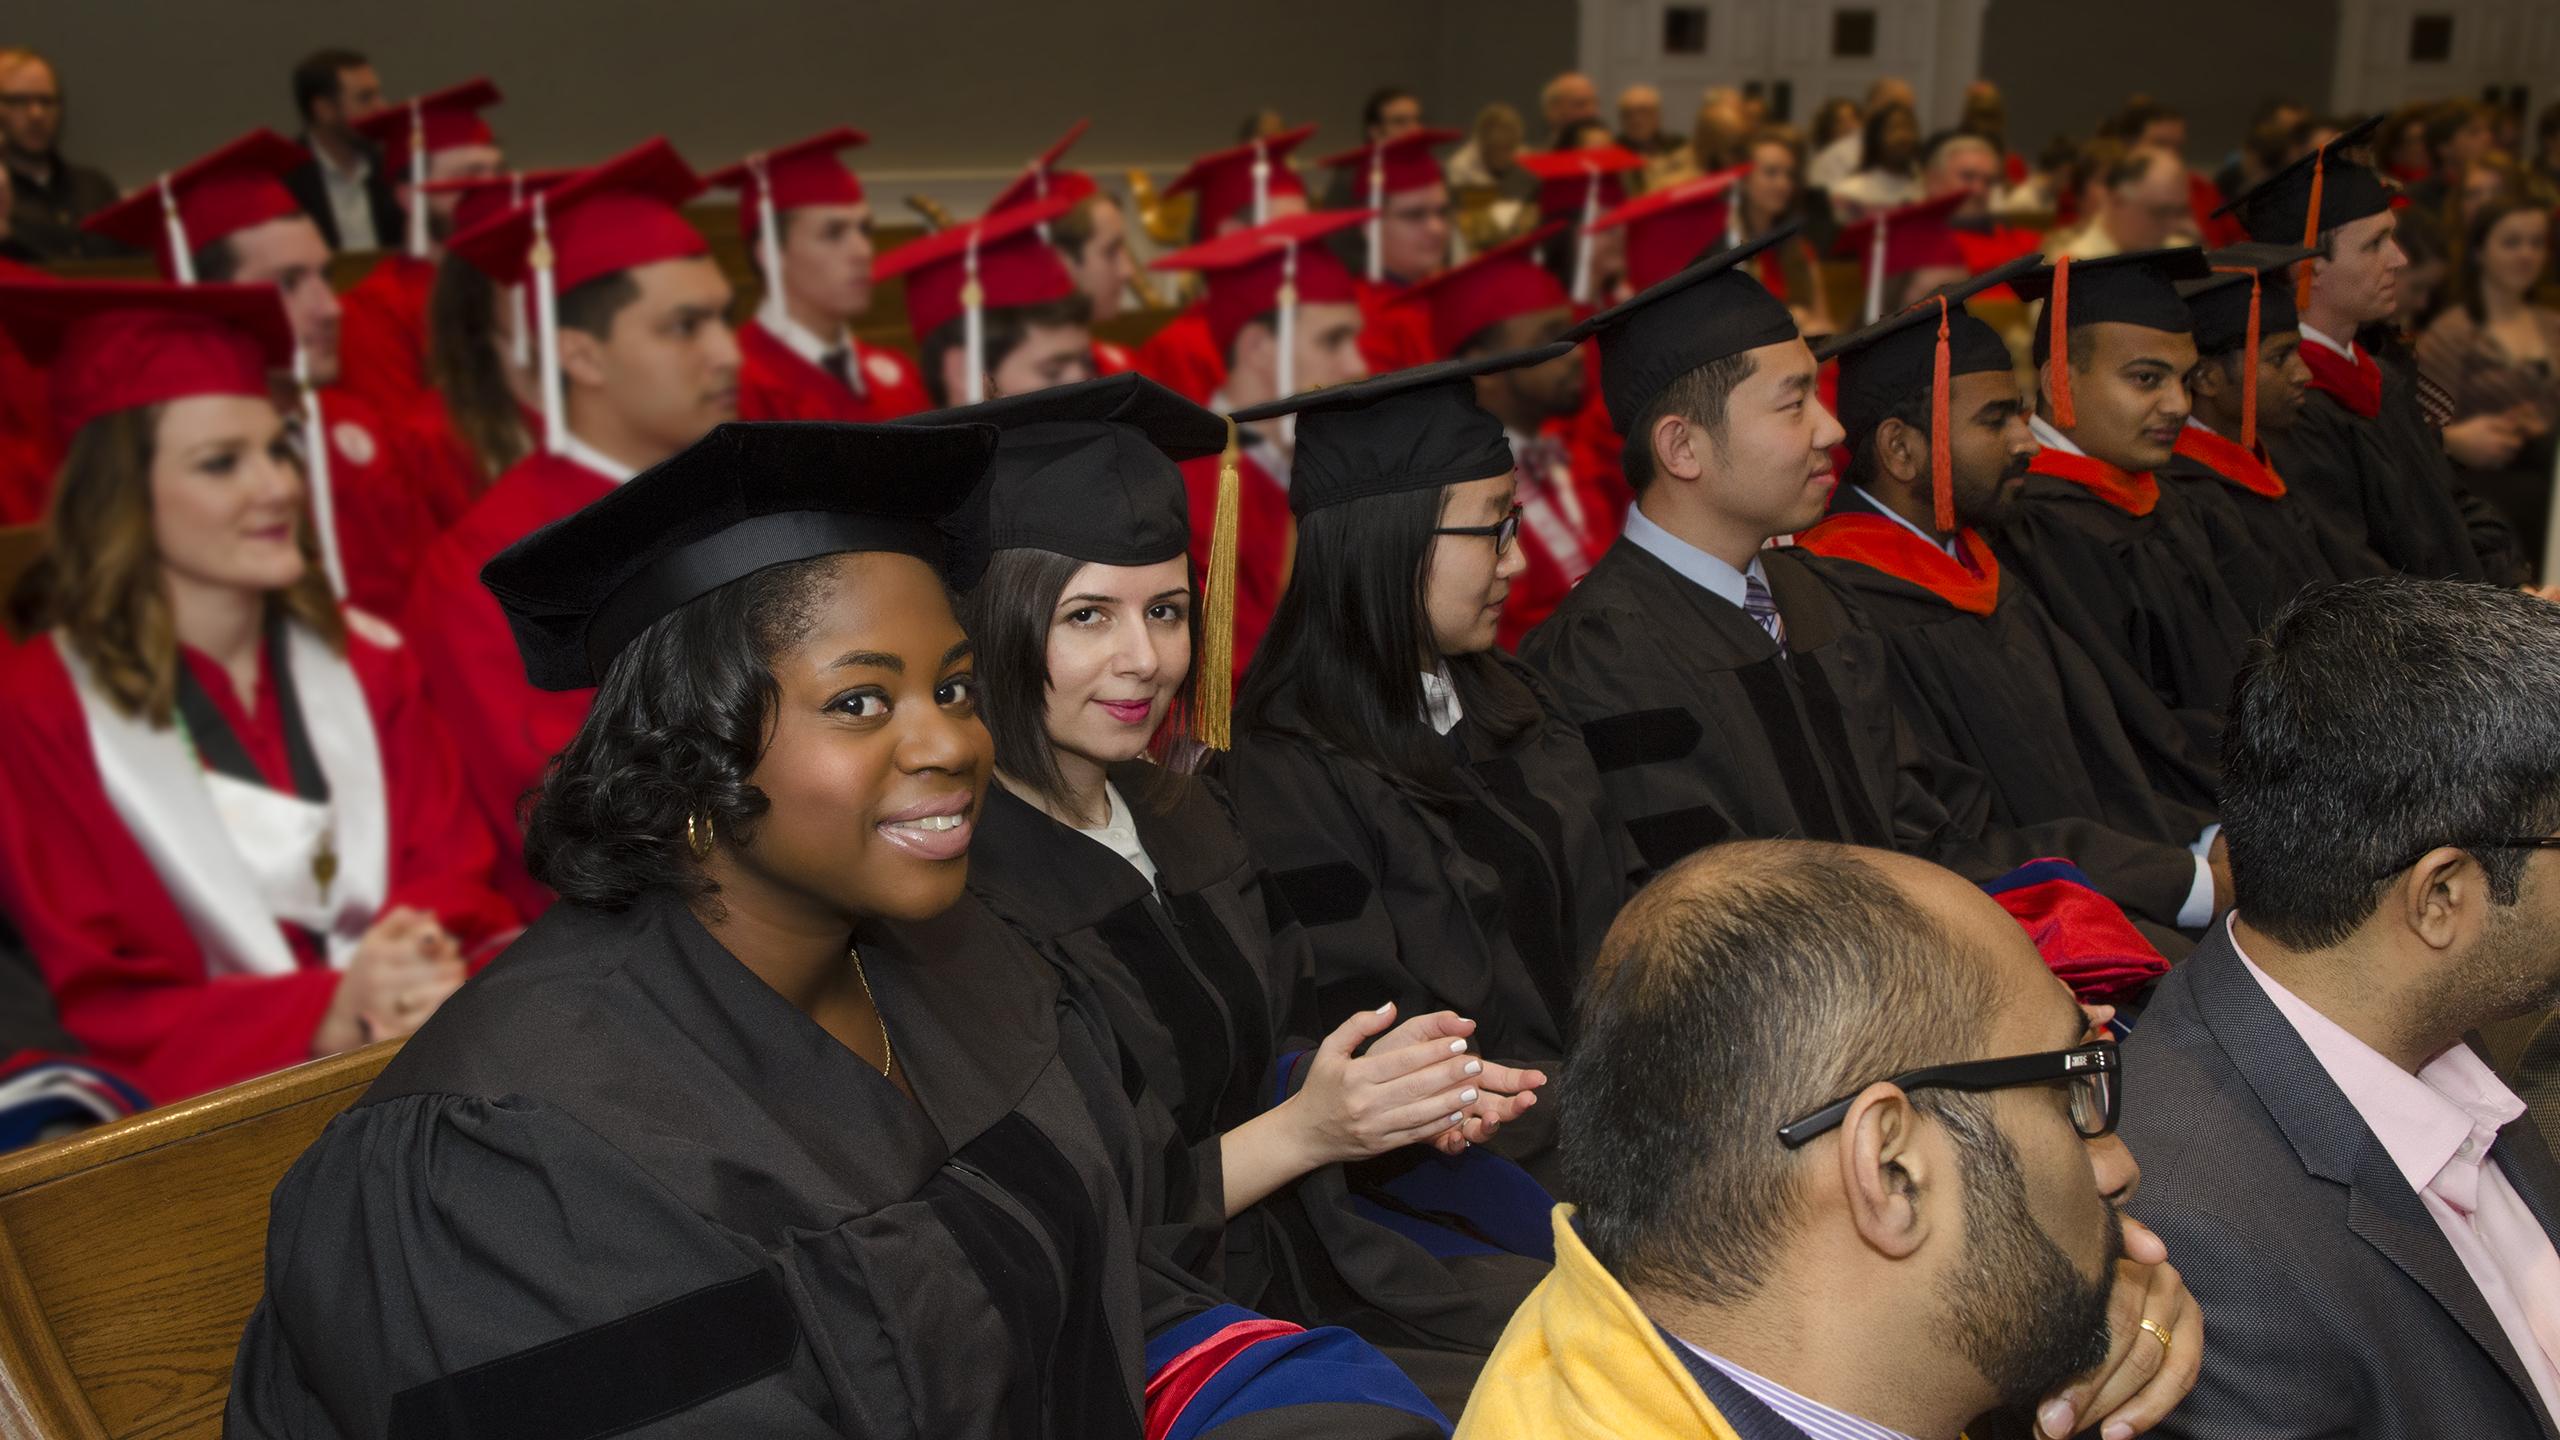 Watch the Fall 2016 Graduation Ceremony